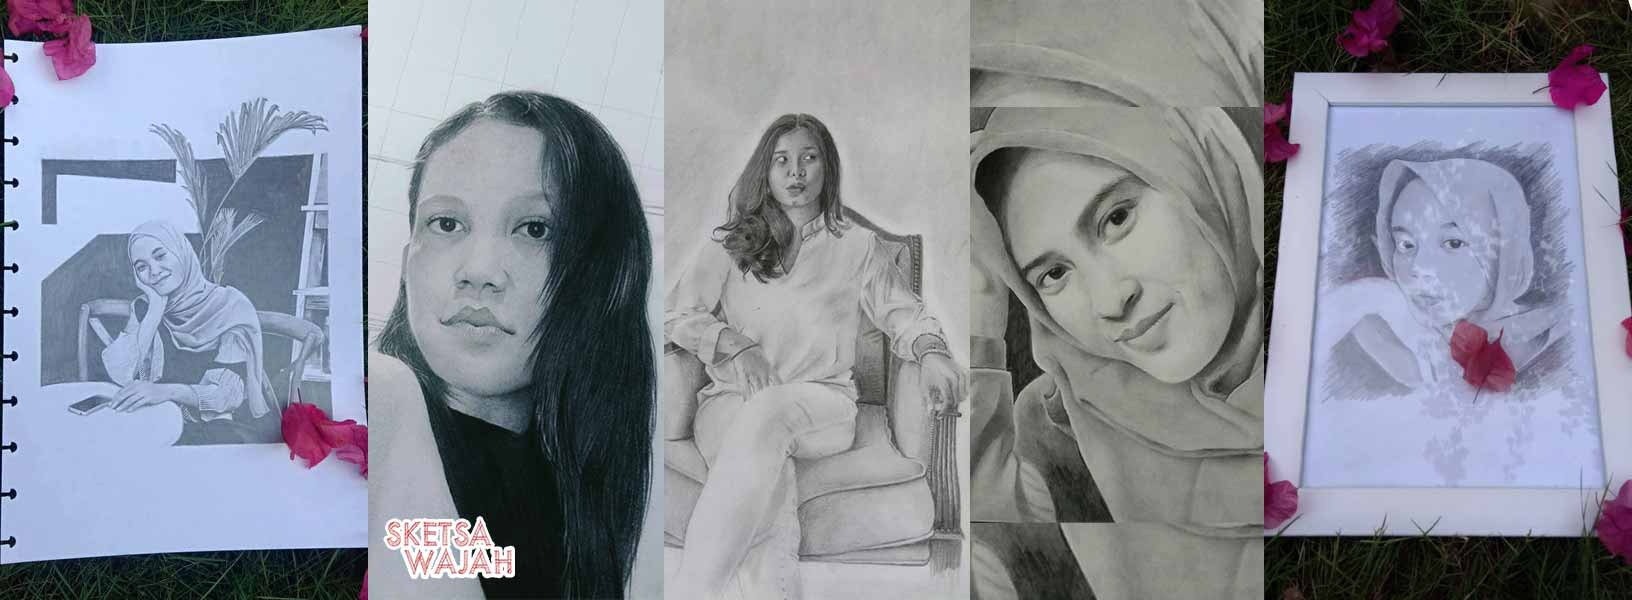 Karya Rizal Efendy sketcher Sketsa Wajah